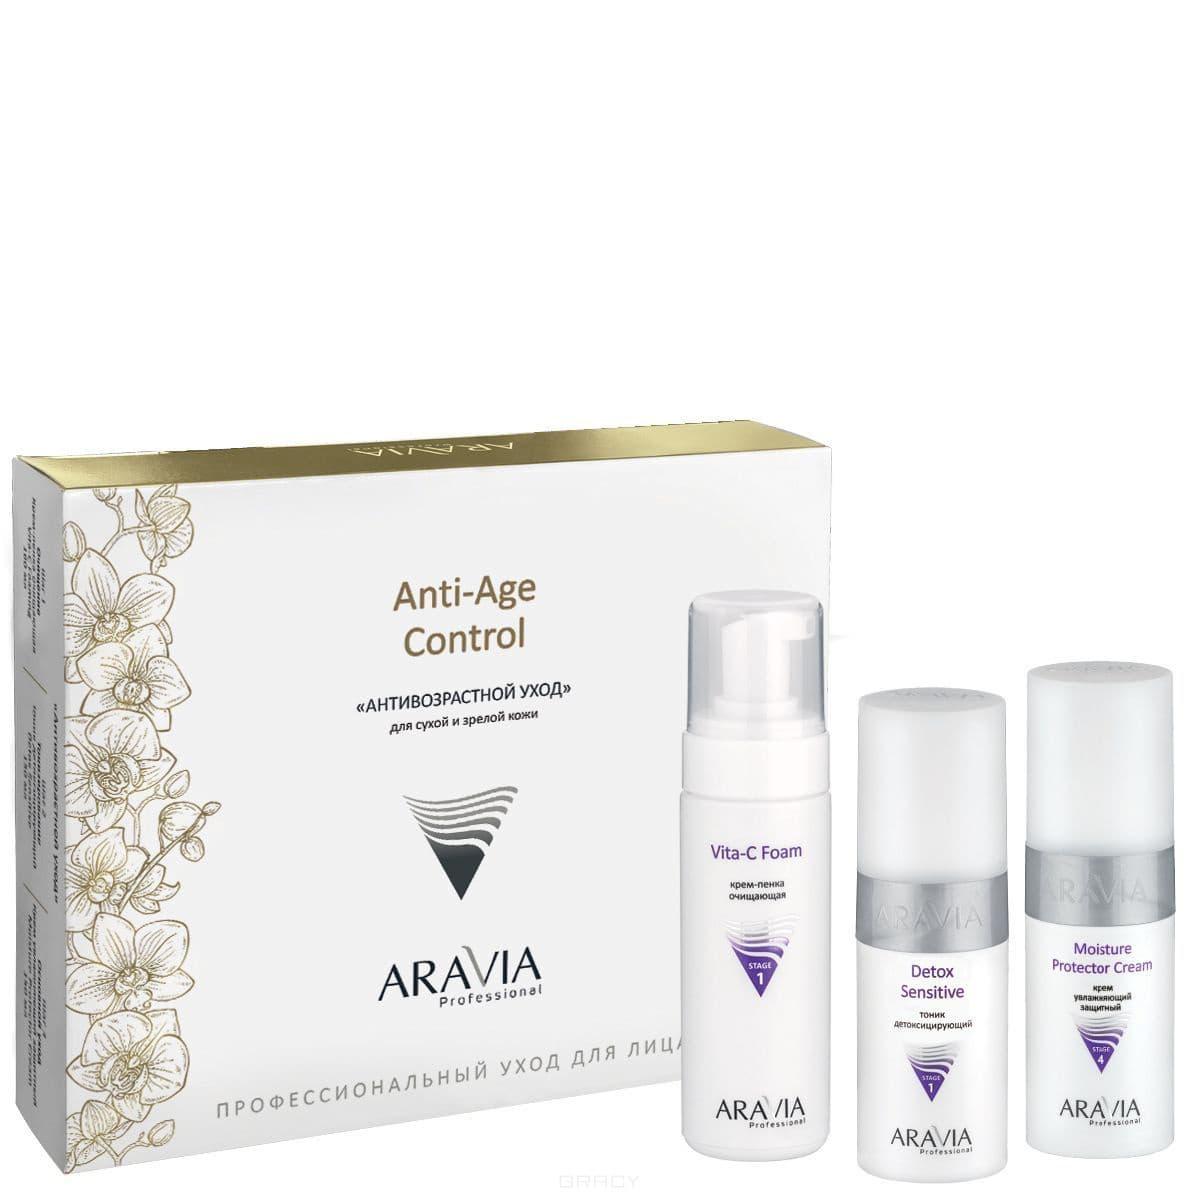 Фото - Aravia, Набор для лица «Антивозрастной уход», 2х150 мл+160 мл aravia тоник детоксицирующий detox sensitive 250 мл